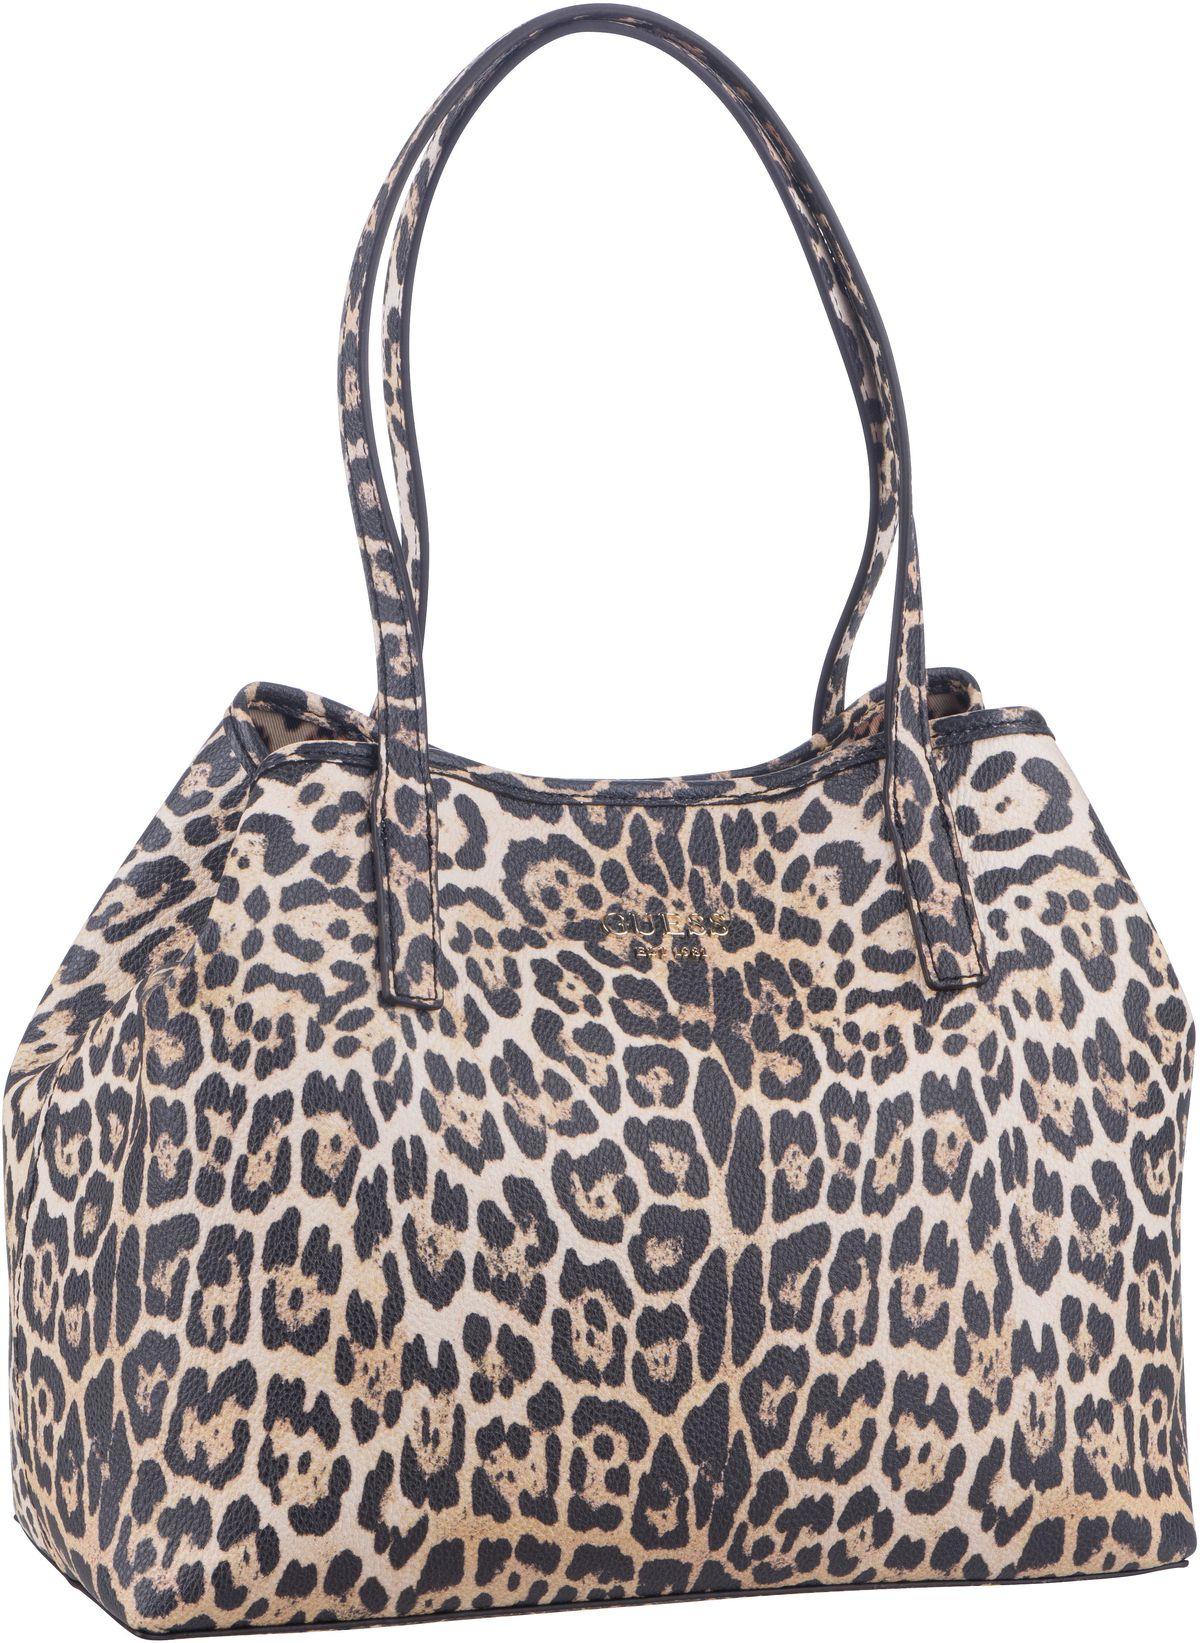 Handtasche Vikky Tote Leopard